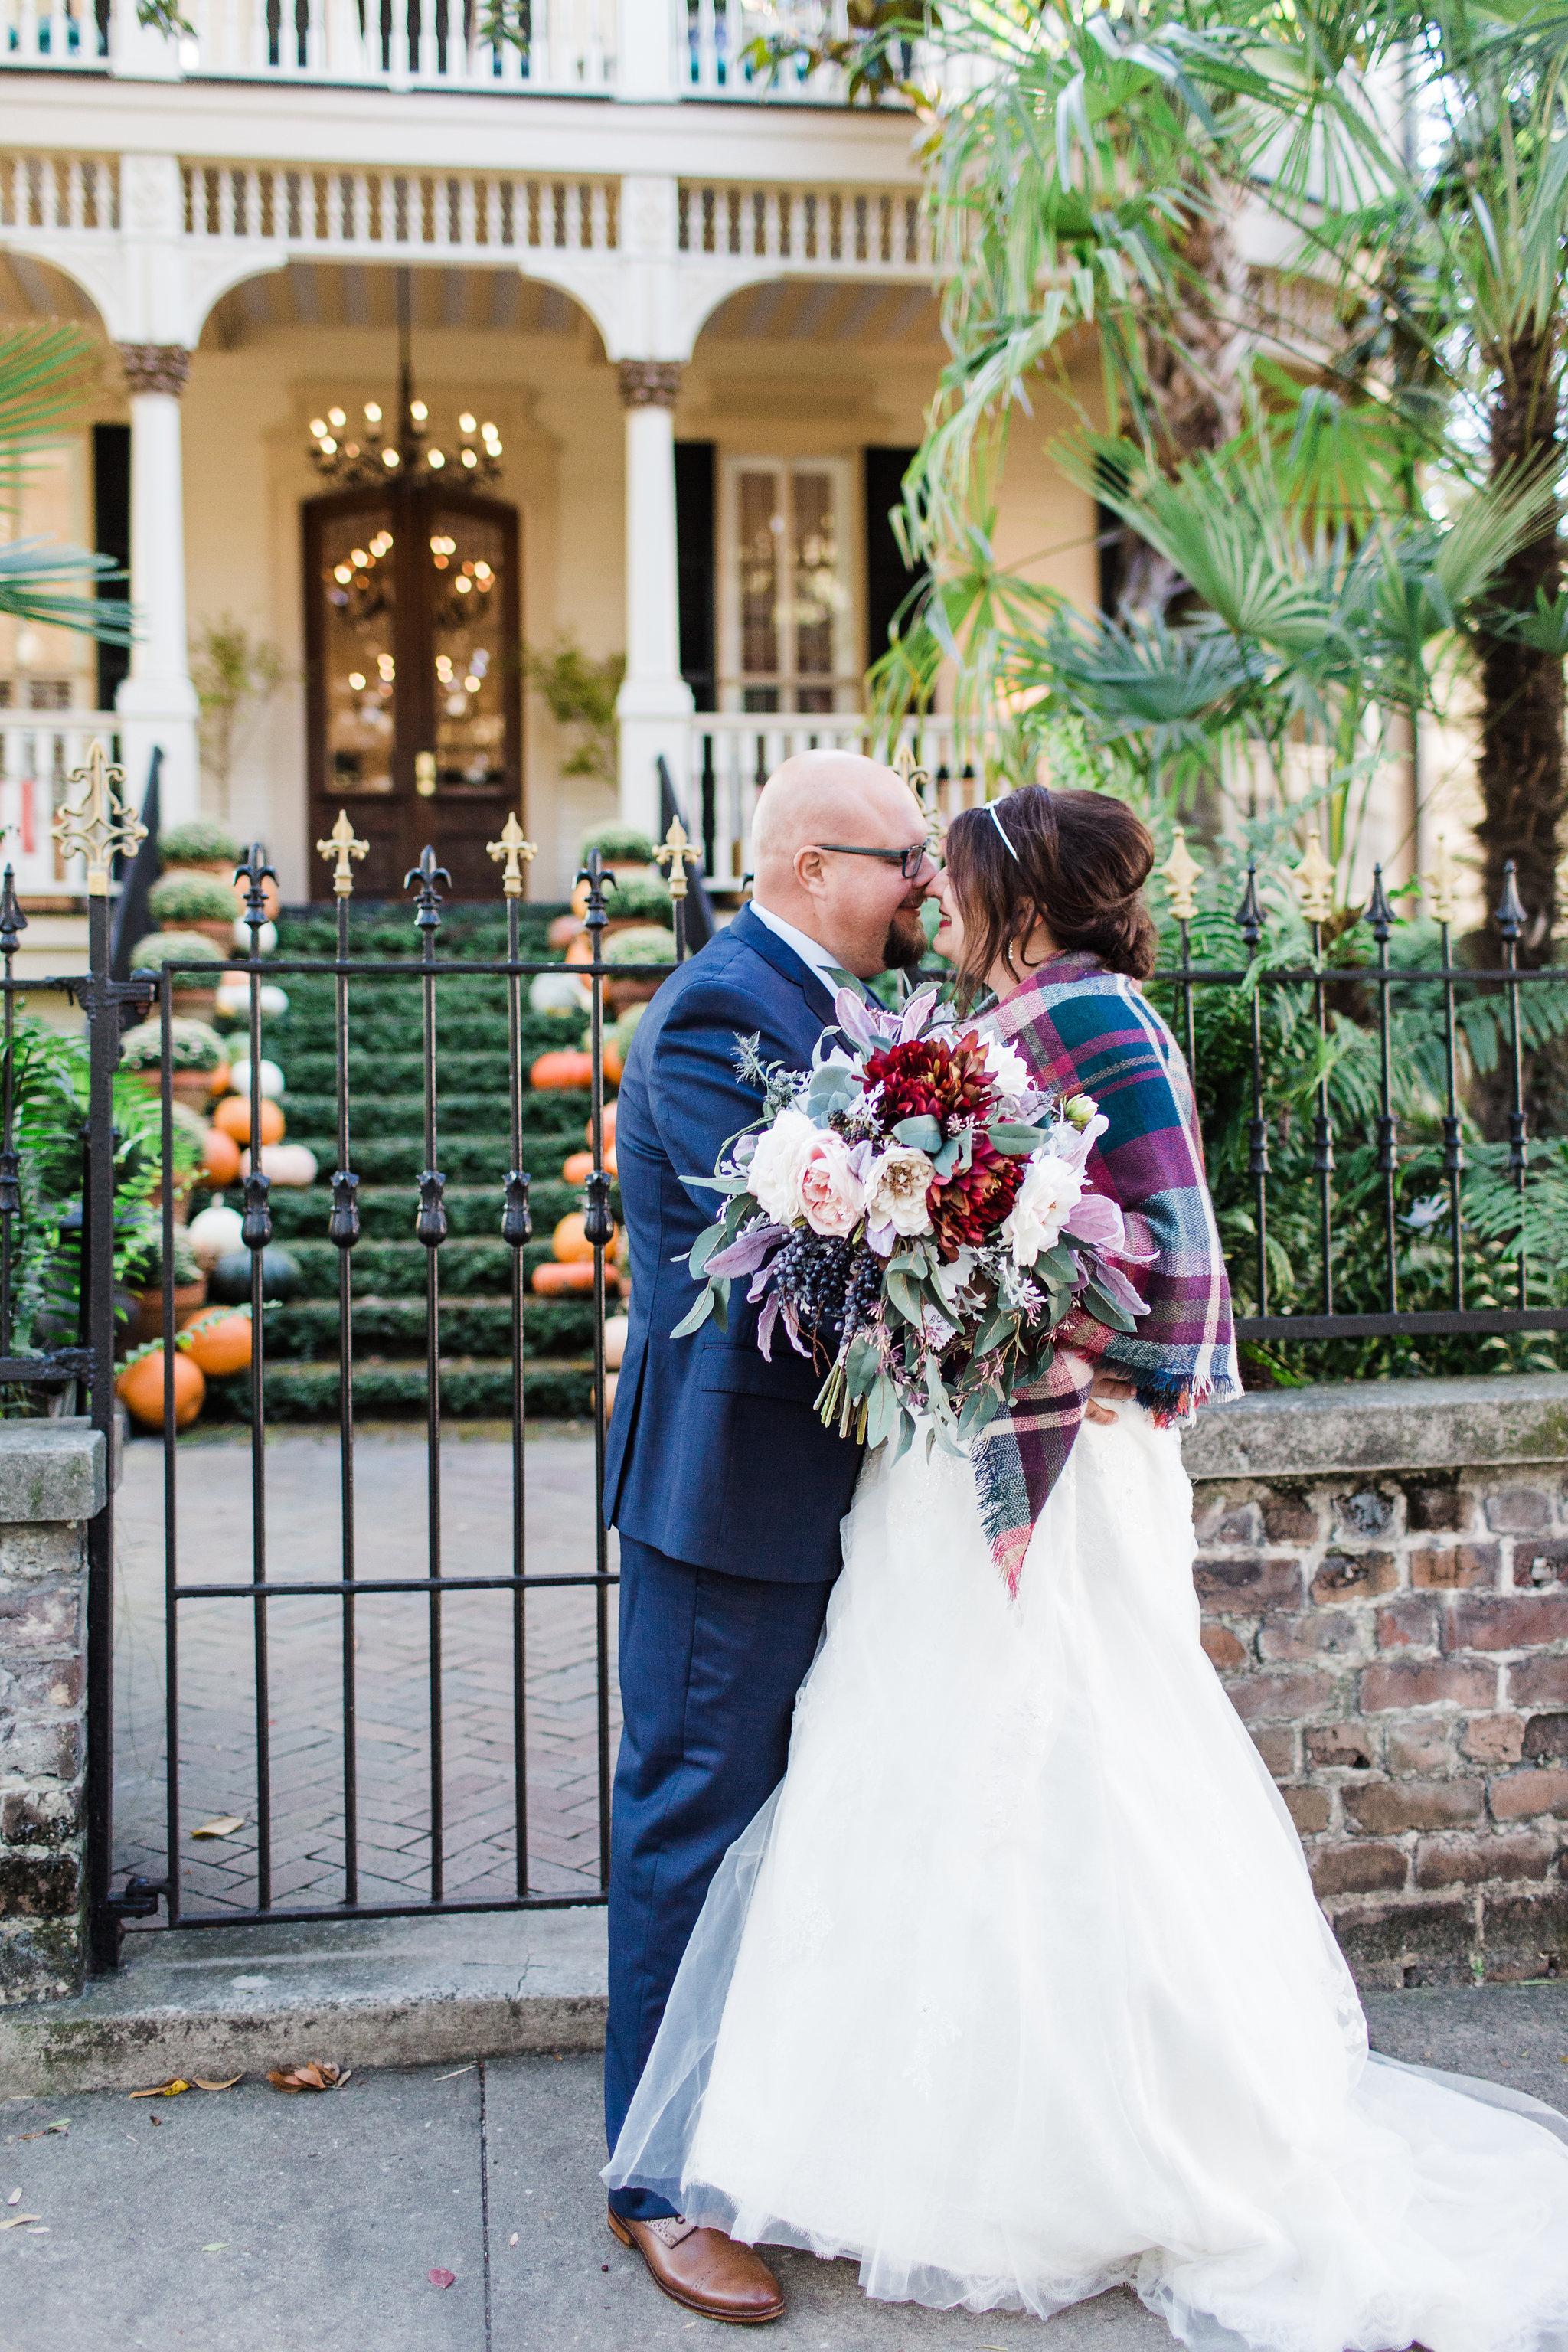 apt-b-photography-kristy-rob-wormsloe-elopment-savannah-wedding-photographer-savannah-elopement-wormsloe-wedding-historic-savannah-elopement-photographer-savannah-fall-wedding-33.jpg